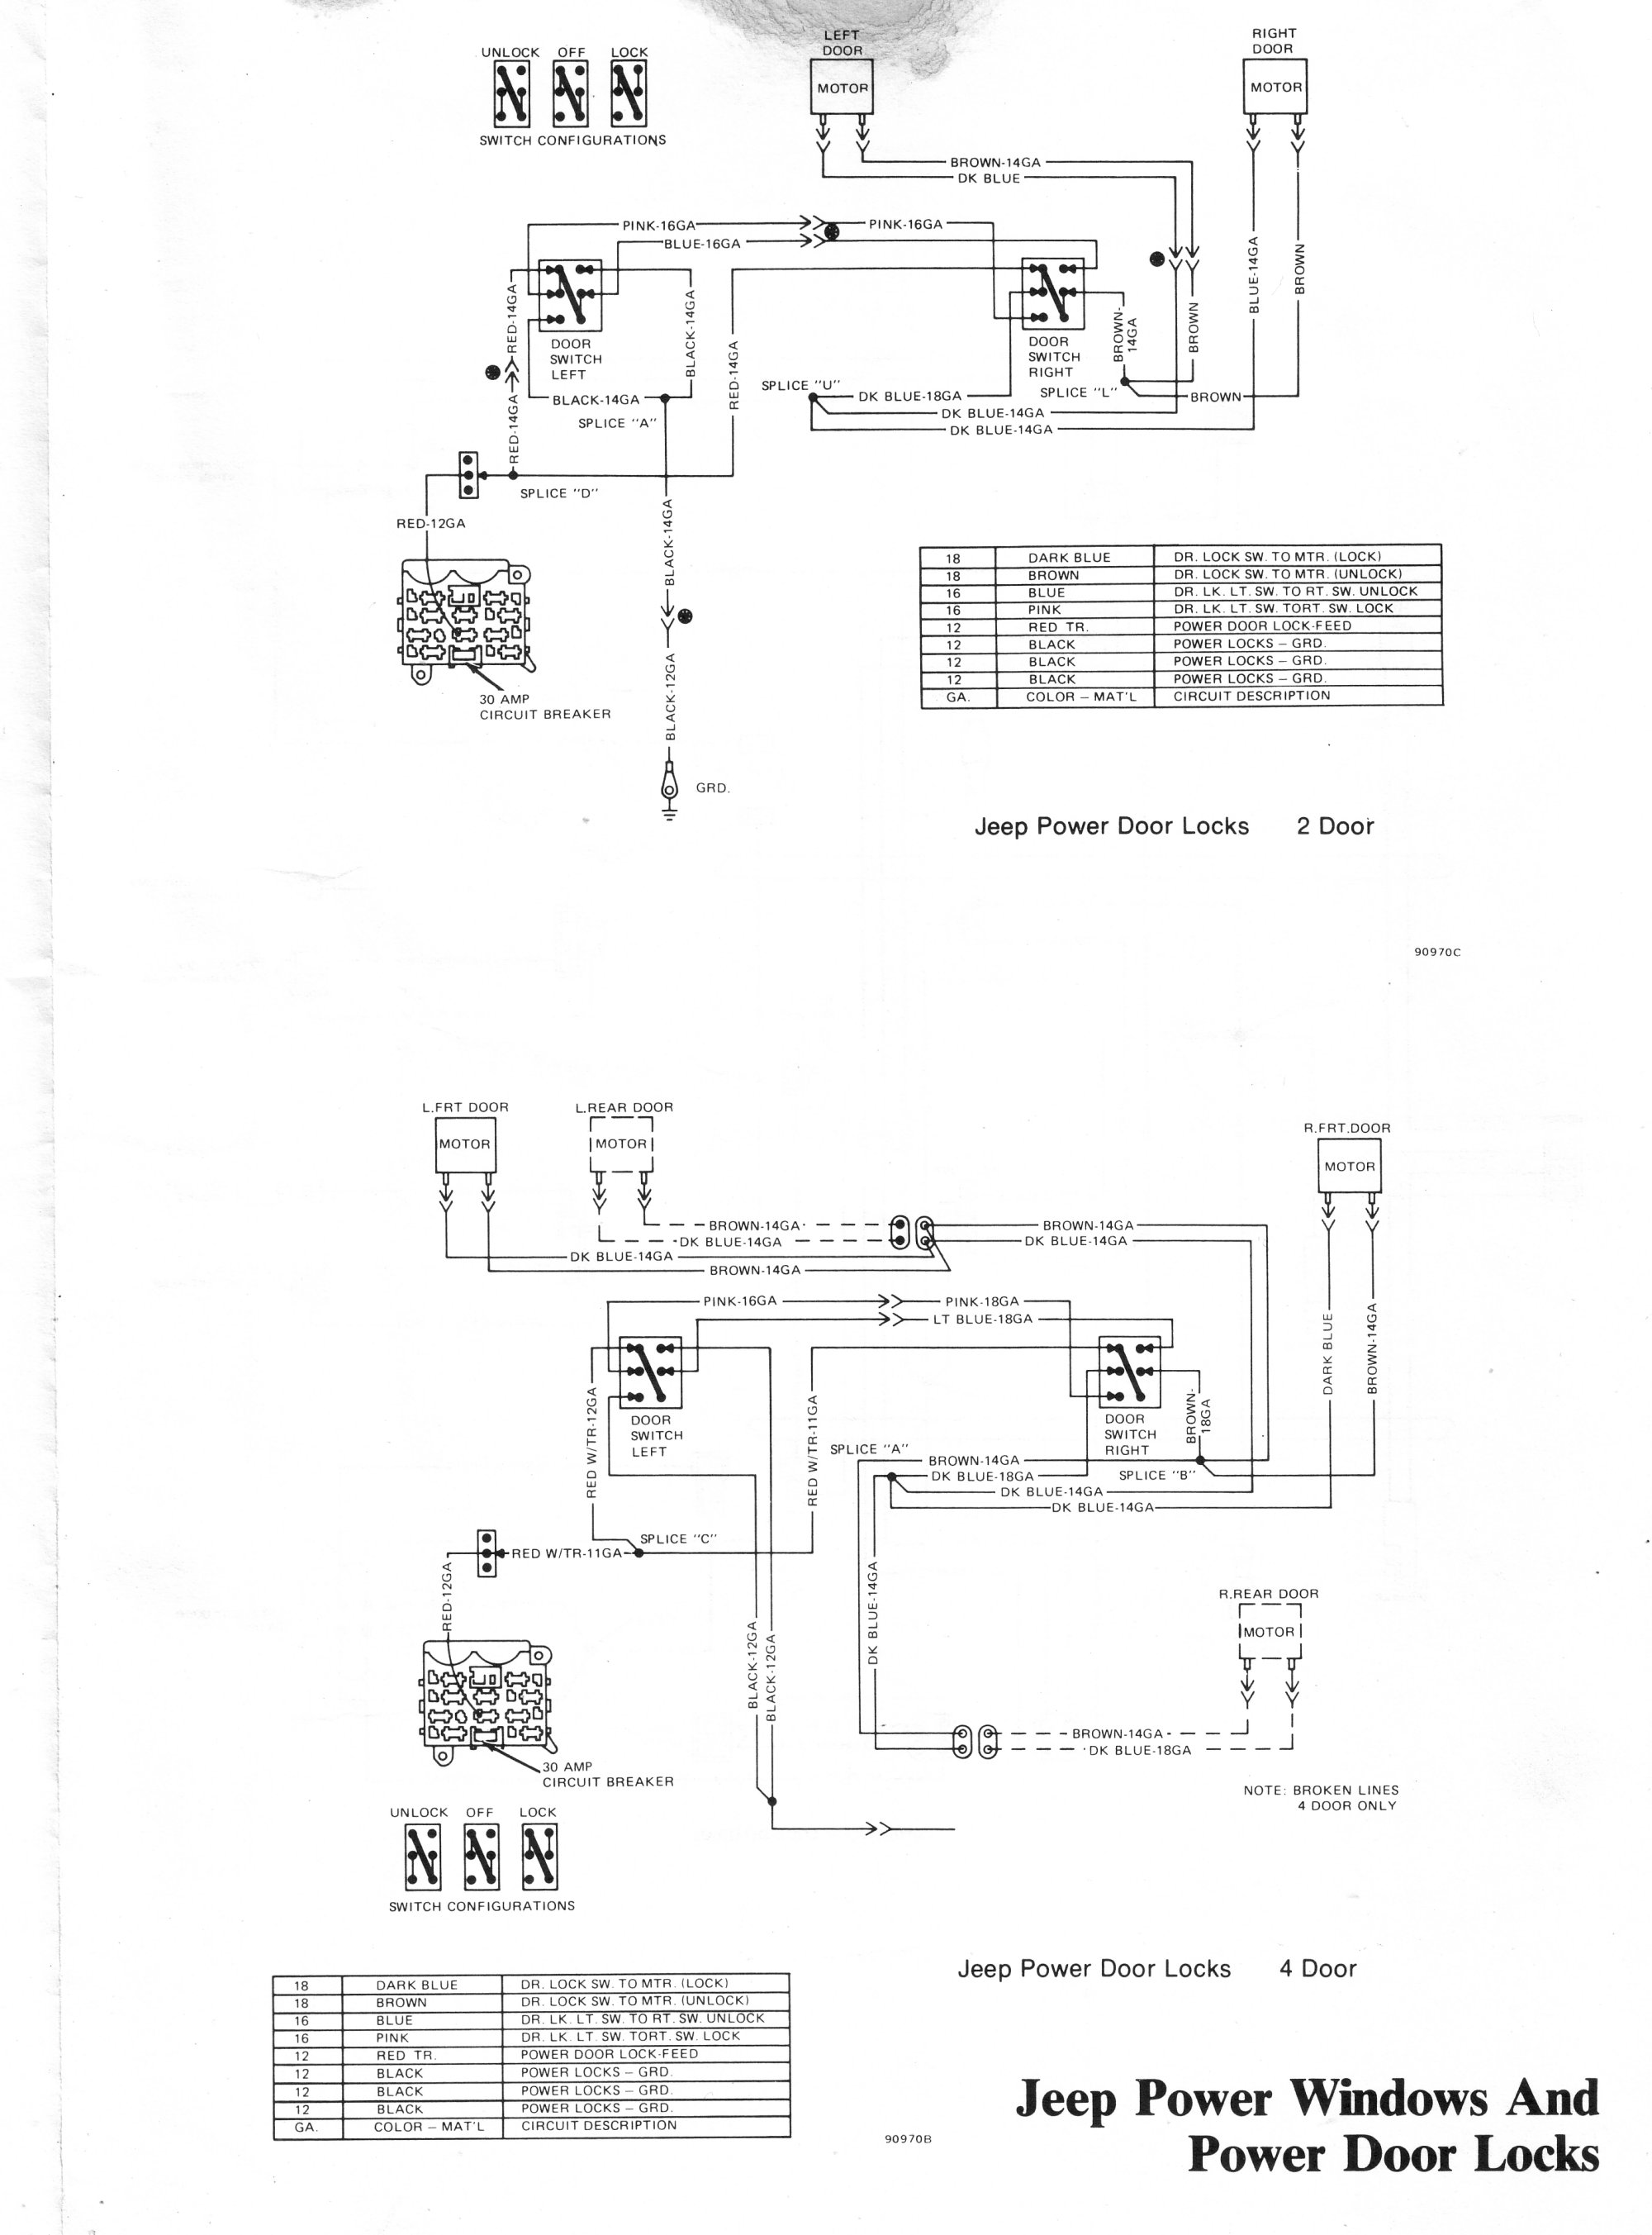 1980_cherokee_wagoneer_truck_Window_Door_pg4 tom 'oljeep' collins fsj wiring page Jeep Power Door Lock Wiring Diagram at soozxer.org